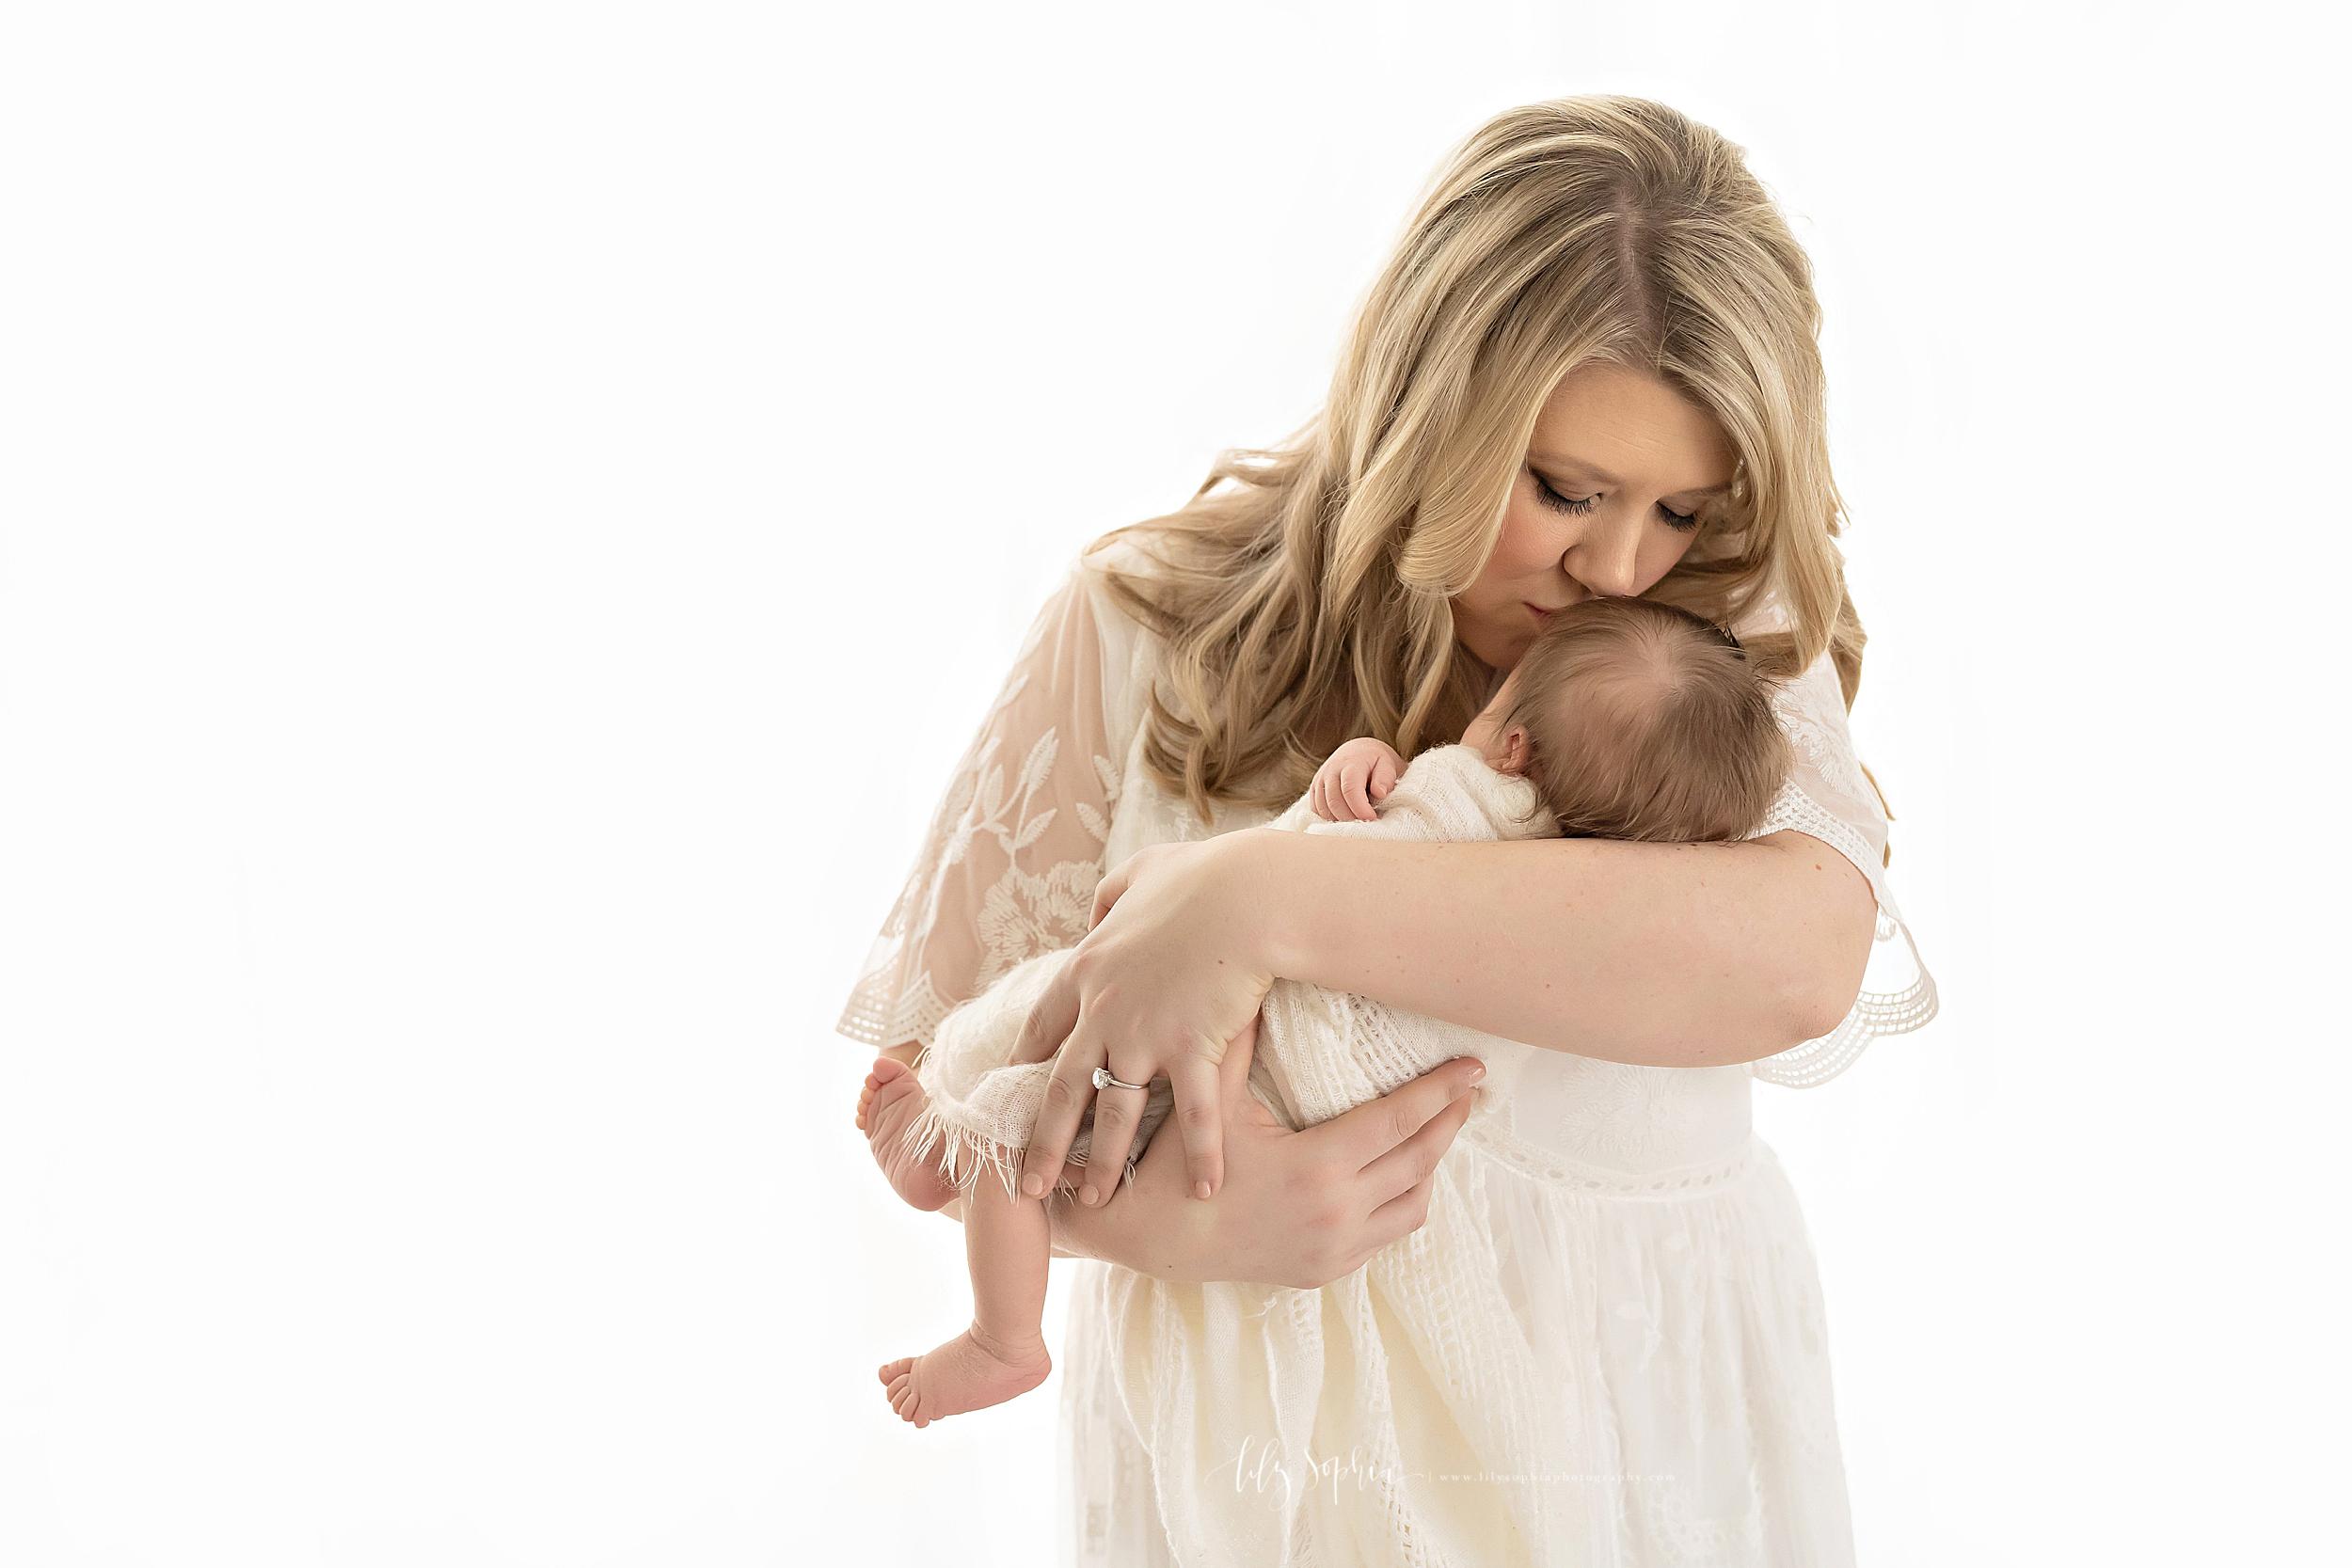 atlanta-midtown-brookhaven-ashford-dunwoody-virginia-highlands-roswell-decatur-lily-sophia-photography-newborn-baby-boy-big-brother-family-studio-session_0621.jpg